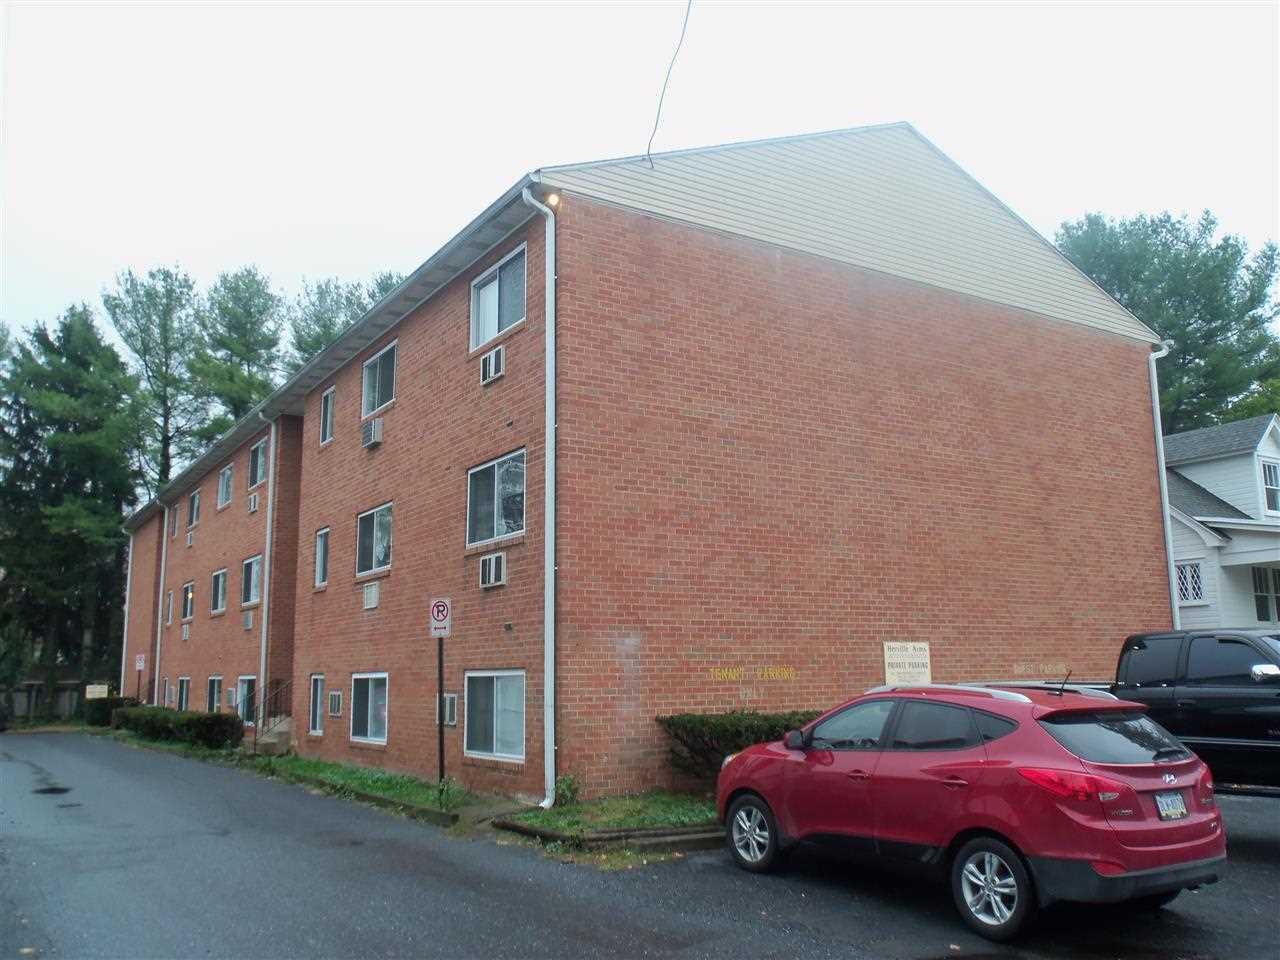 Rental Homes for Rent, ListingId:30610358, location: 459 Hockersville Road Hershey 17033